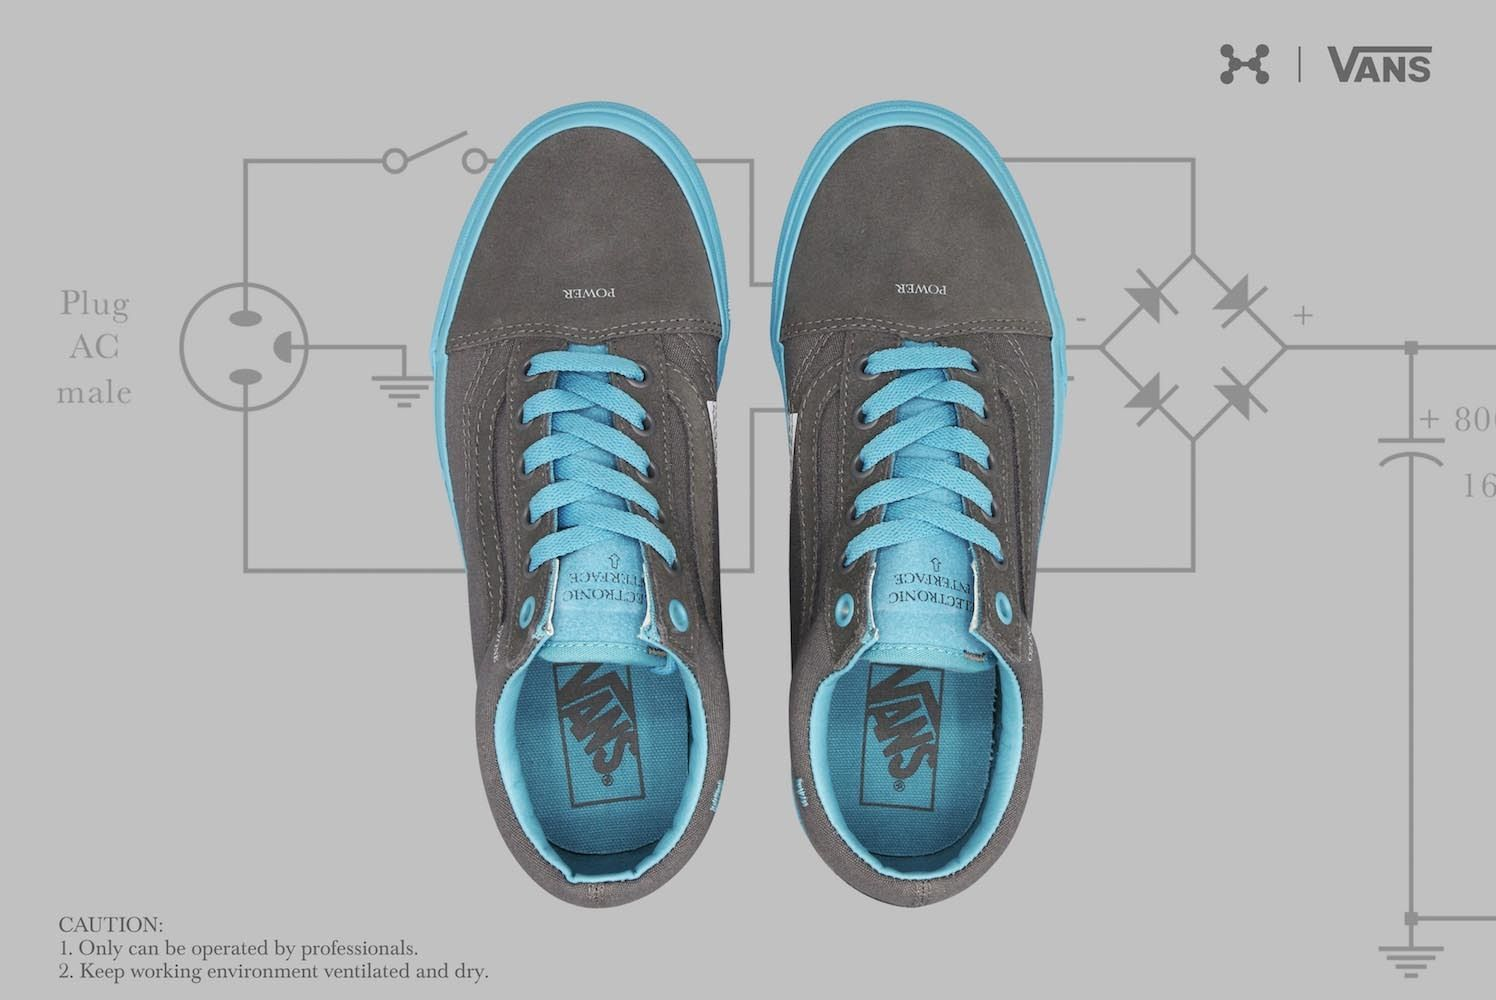 C2H4 Vans Ss18 Collab 07 Sneaker Freaker